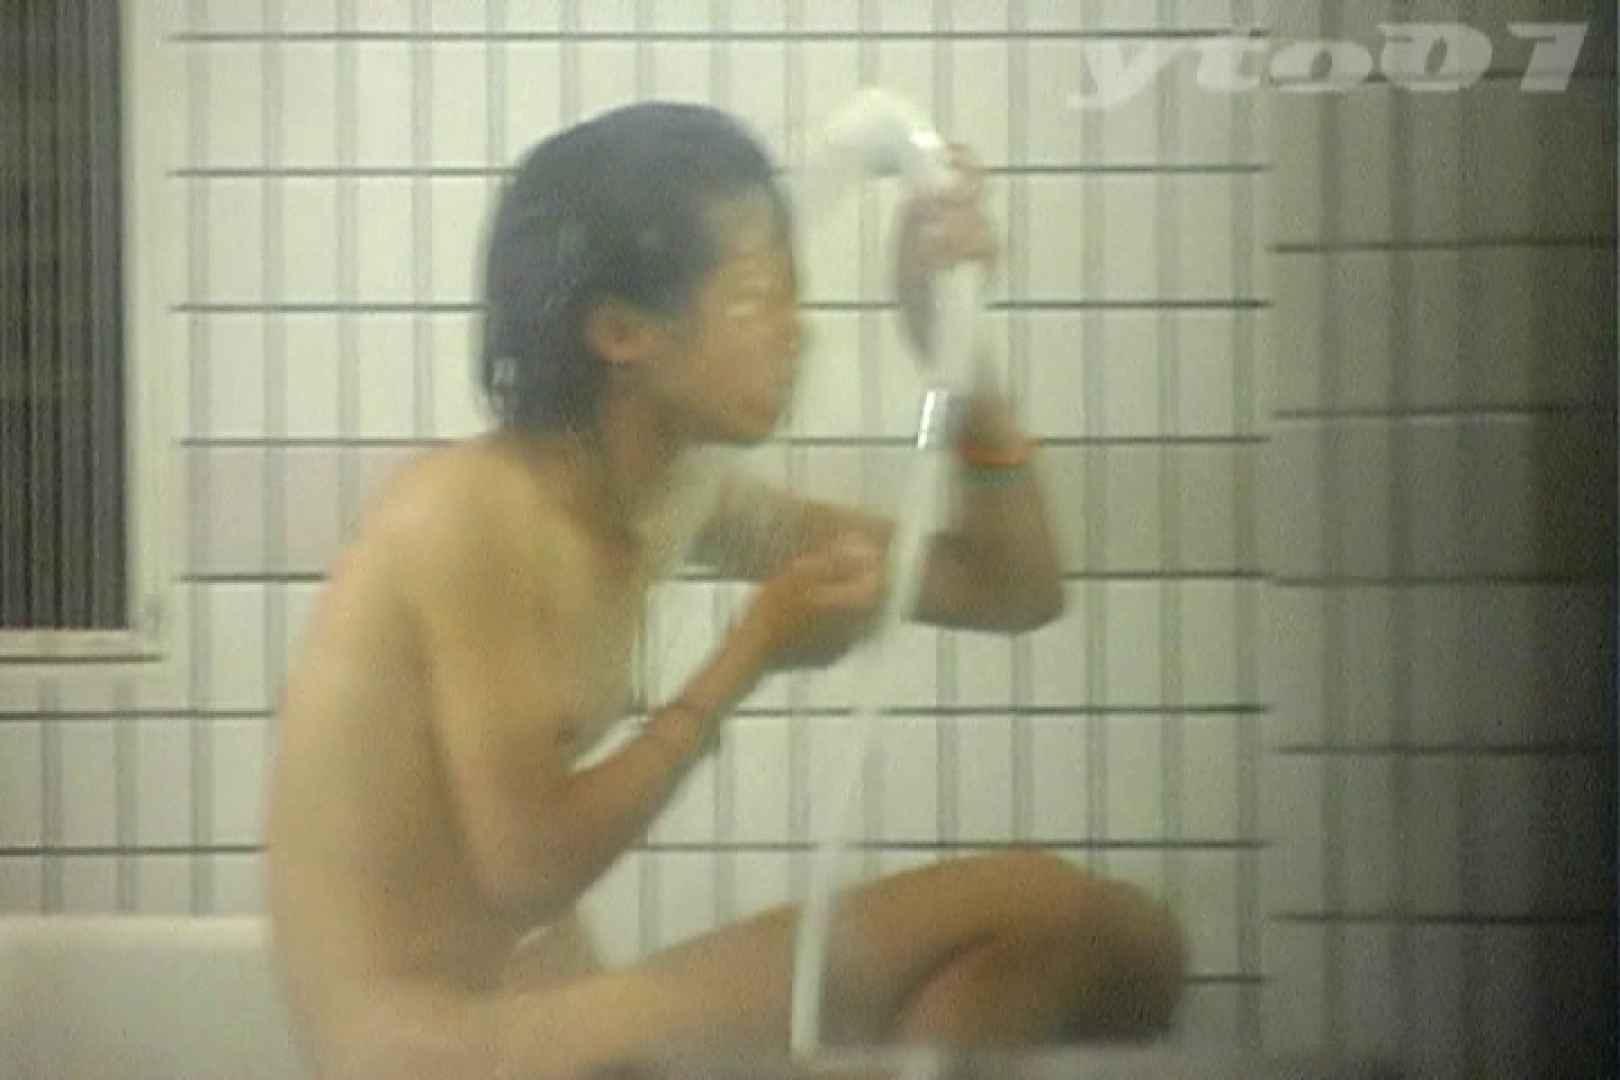 ▲復活限定▲合宿ホテル女風呂盗撮 Vol.07 0 | 0  92画像 91